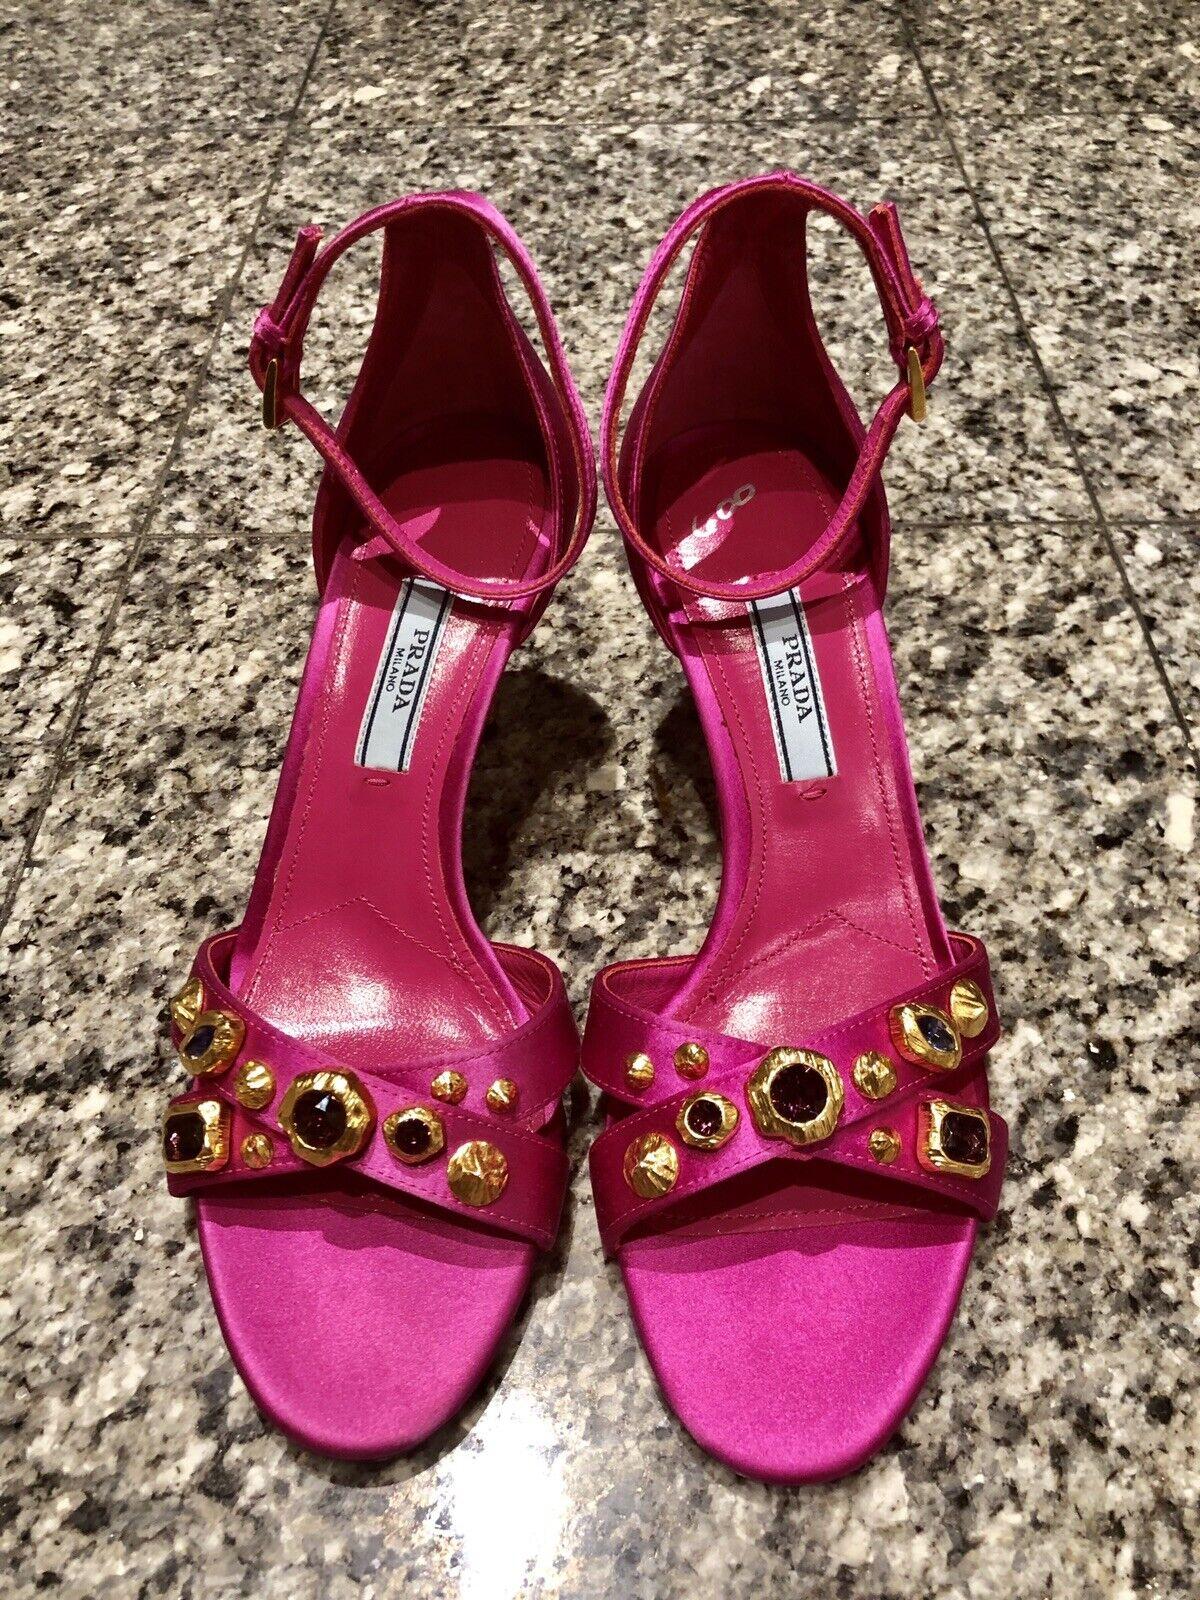 PRADA Fuchsia Pink Satin Jeweled Crystal Ankle Strap Heels